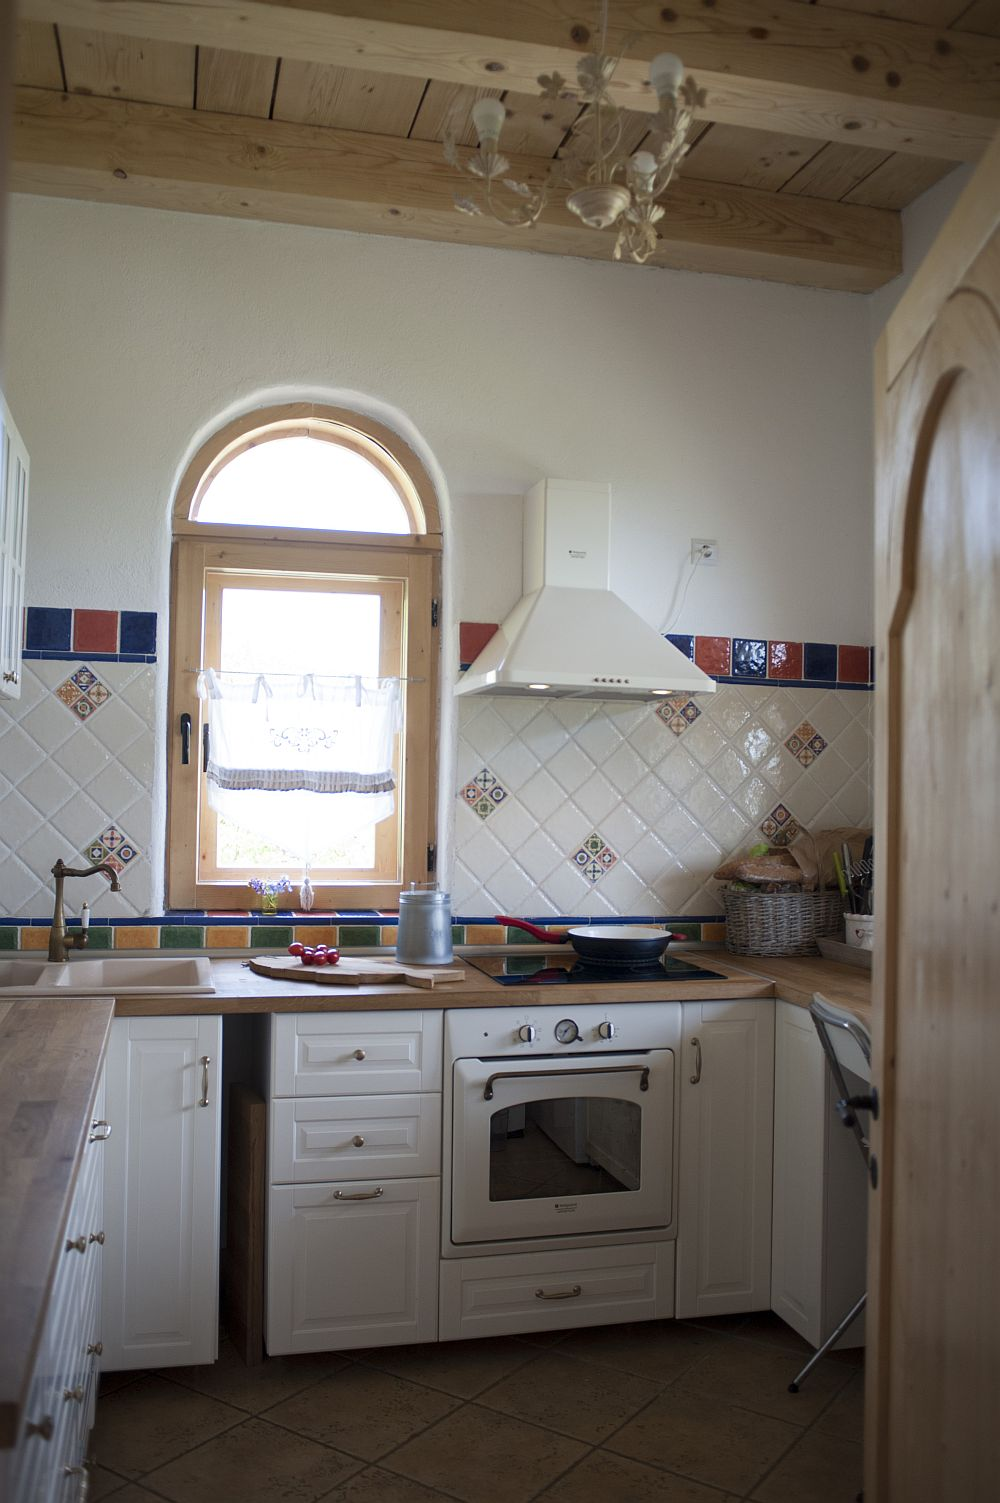 adelaparvu.com despre casa traditionala romaneasca reinterpretata, Foto Dragos Boldea (42)